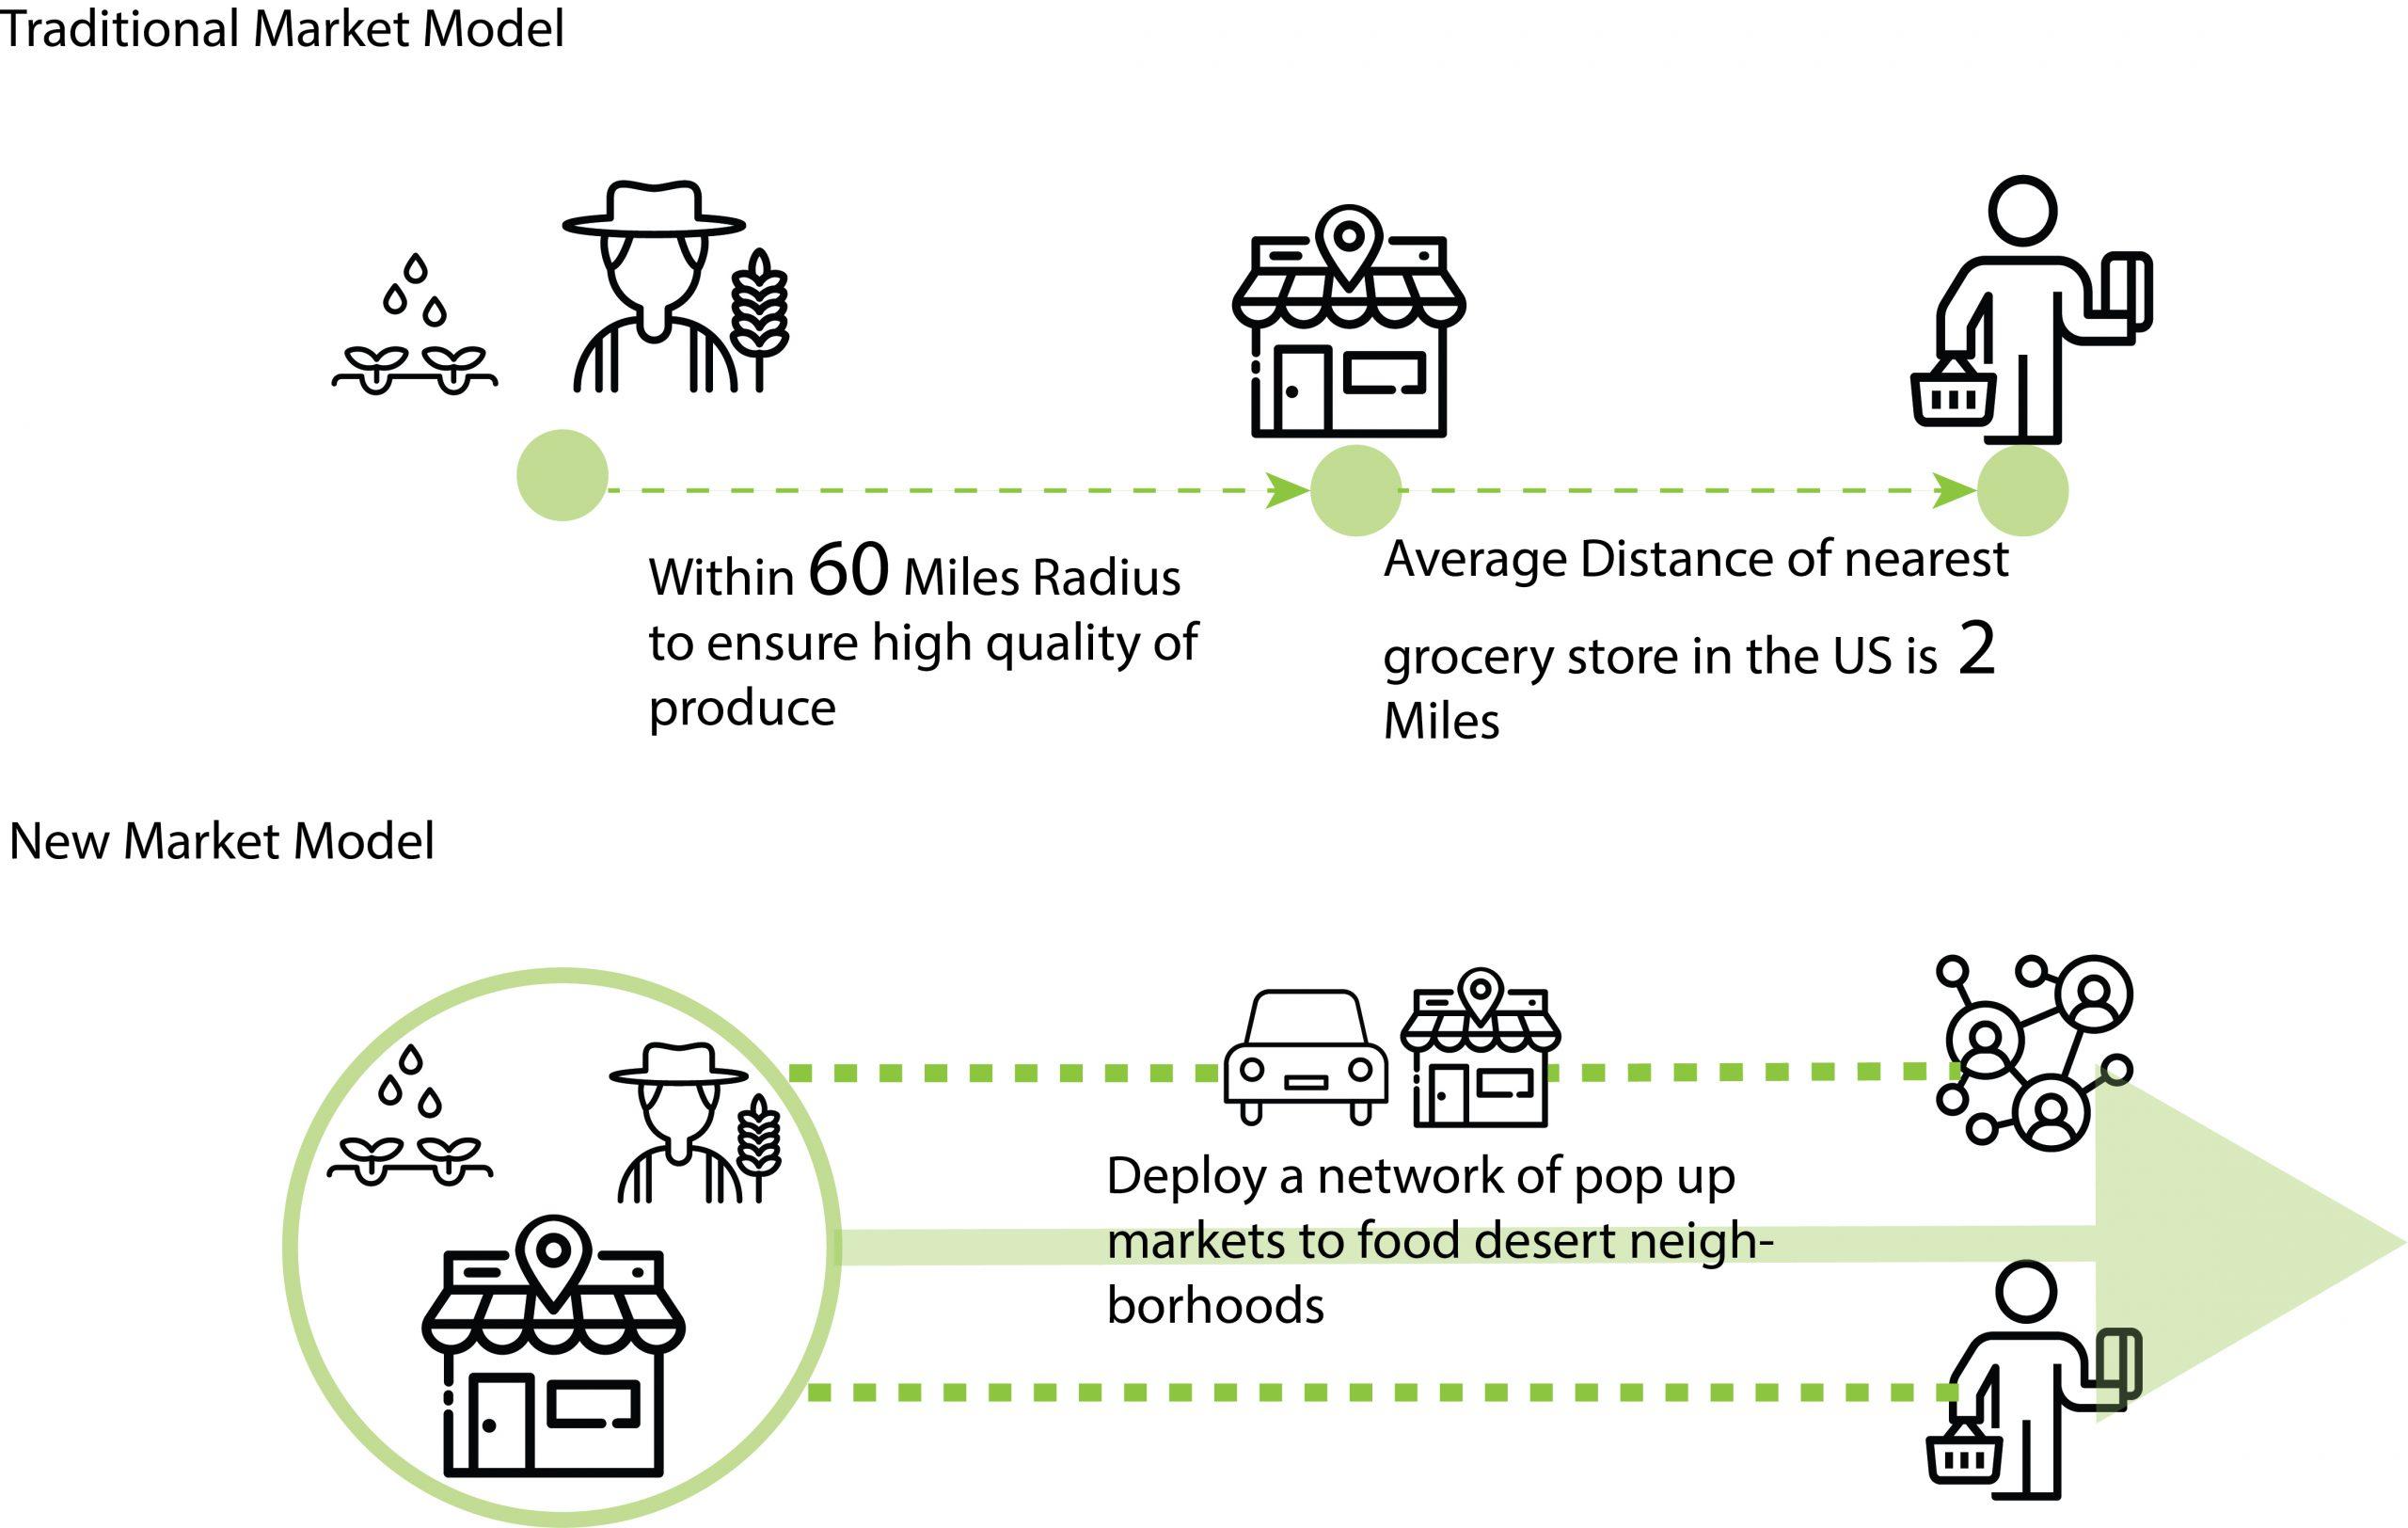 Enru Zhou - New Market Model